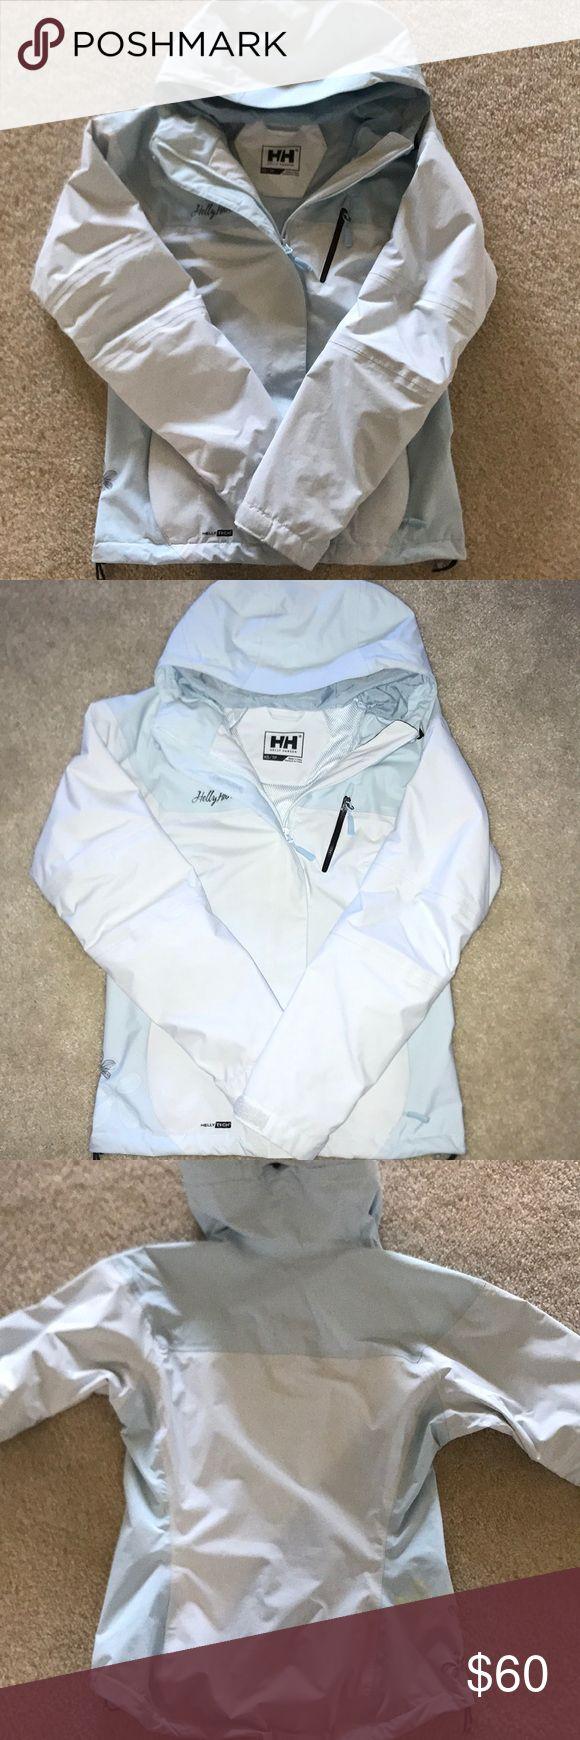 Helly Hansen xs light weight jacket Baby blue, xs, gently worn helly Hansen jacket light weight jacket Helly Hansen Jackets & Coats